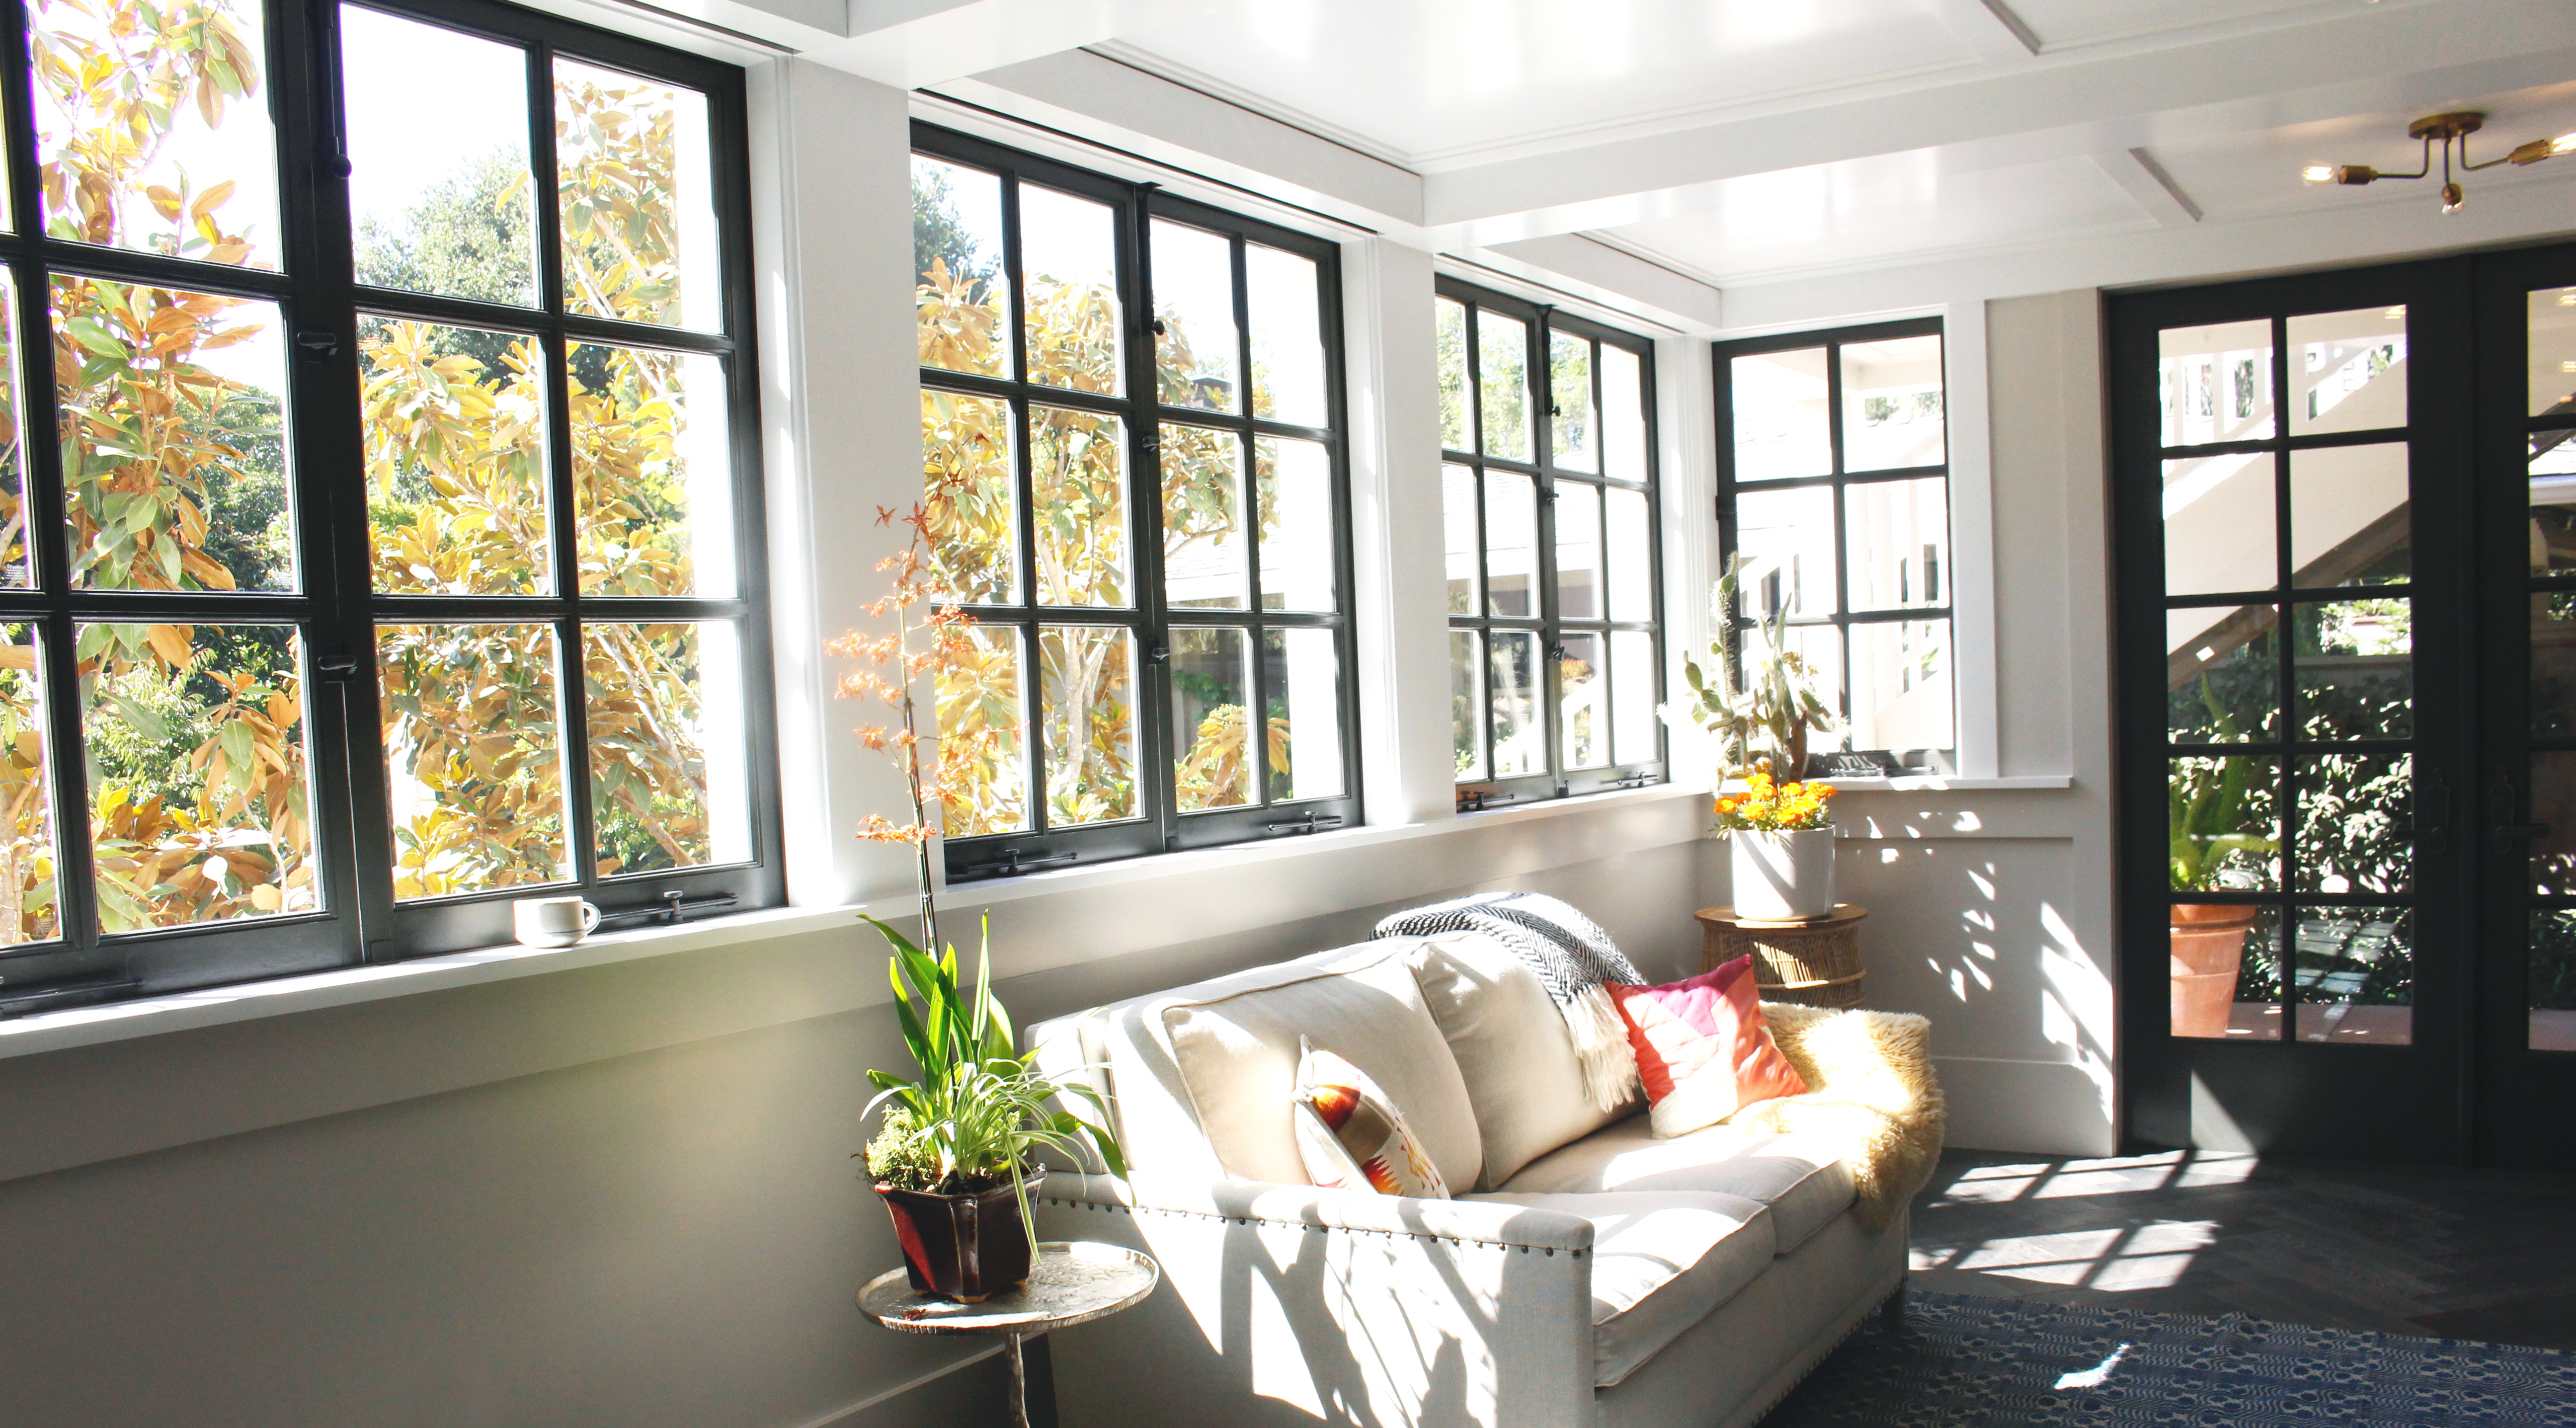 windows and door // Hazel Addition by Sky Lanigan Studios